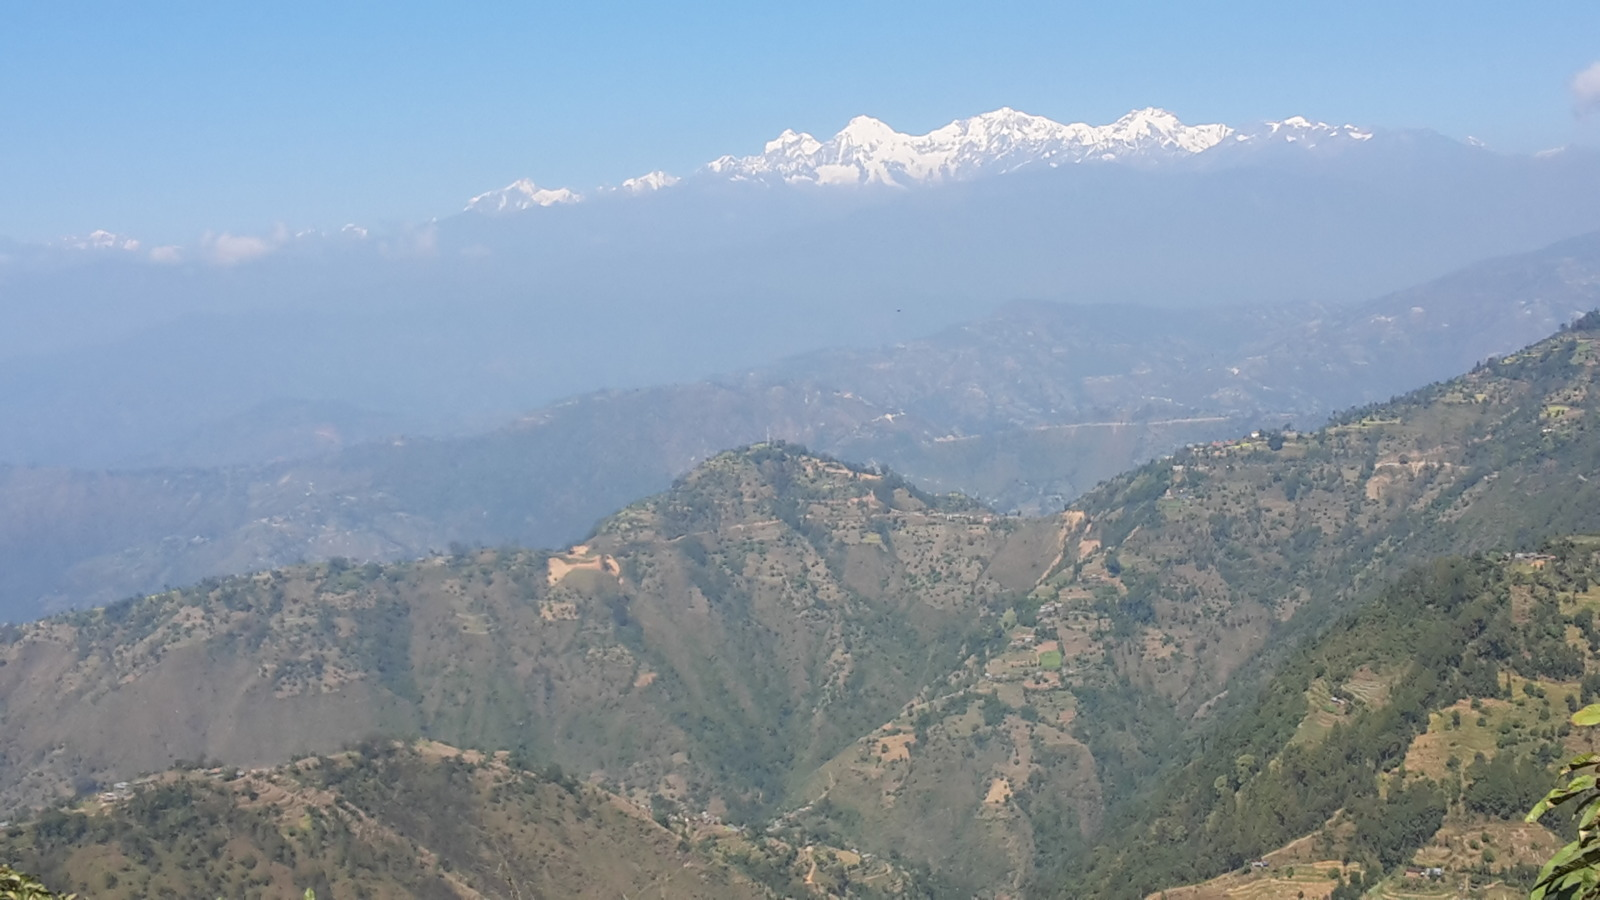 Panoramic of mountains